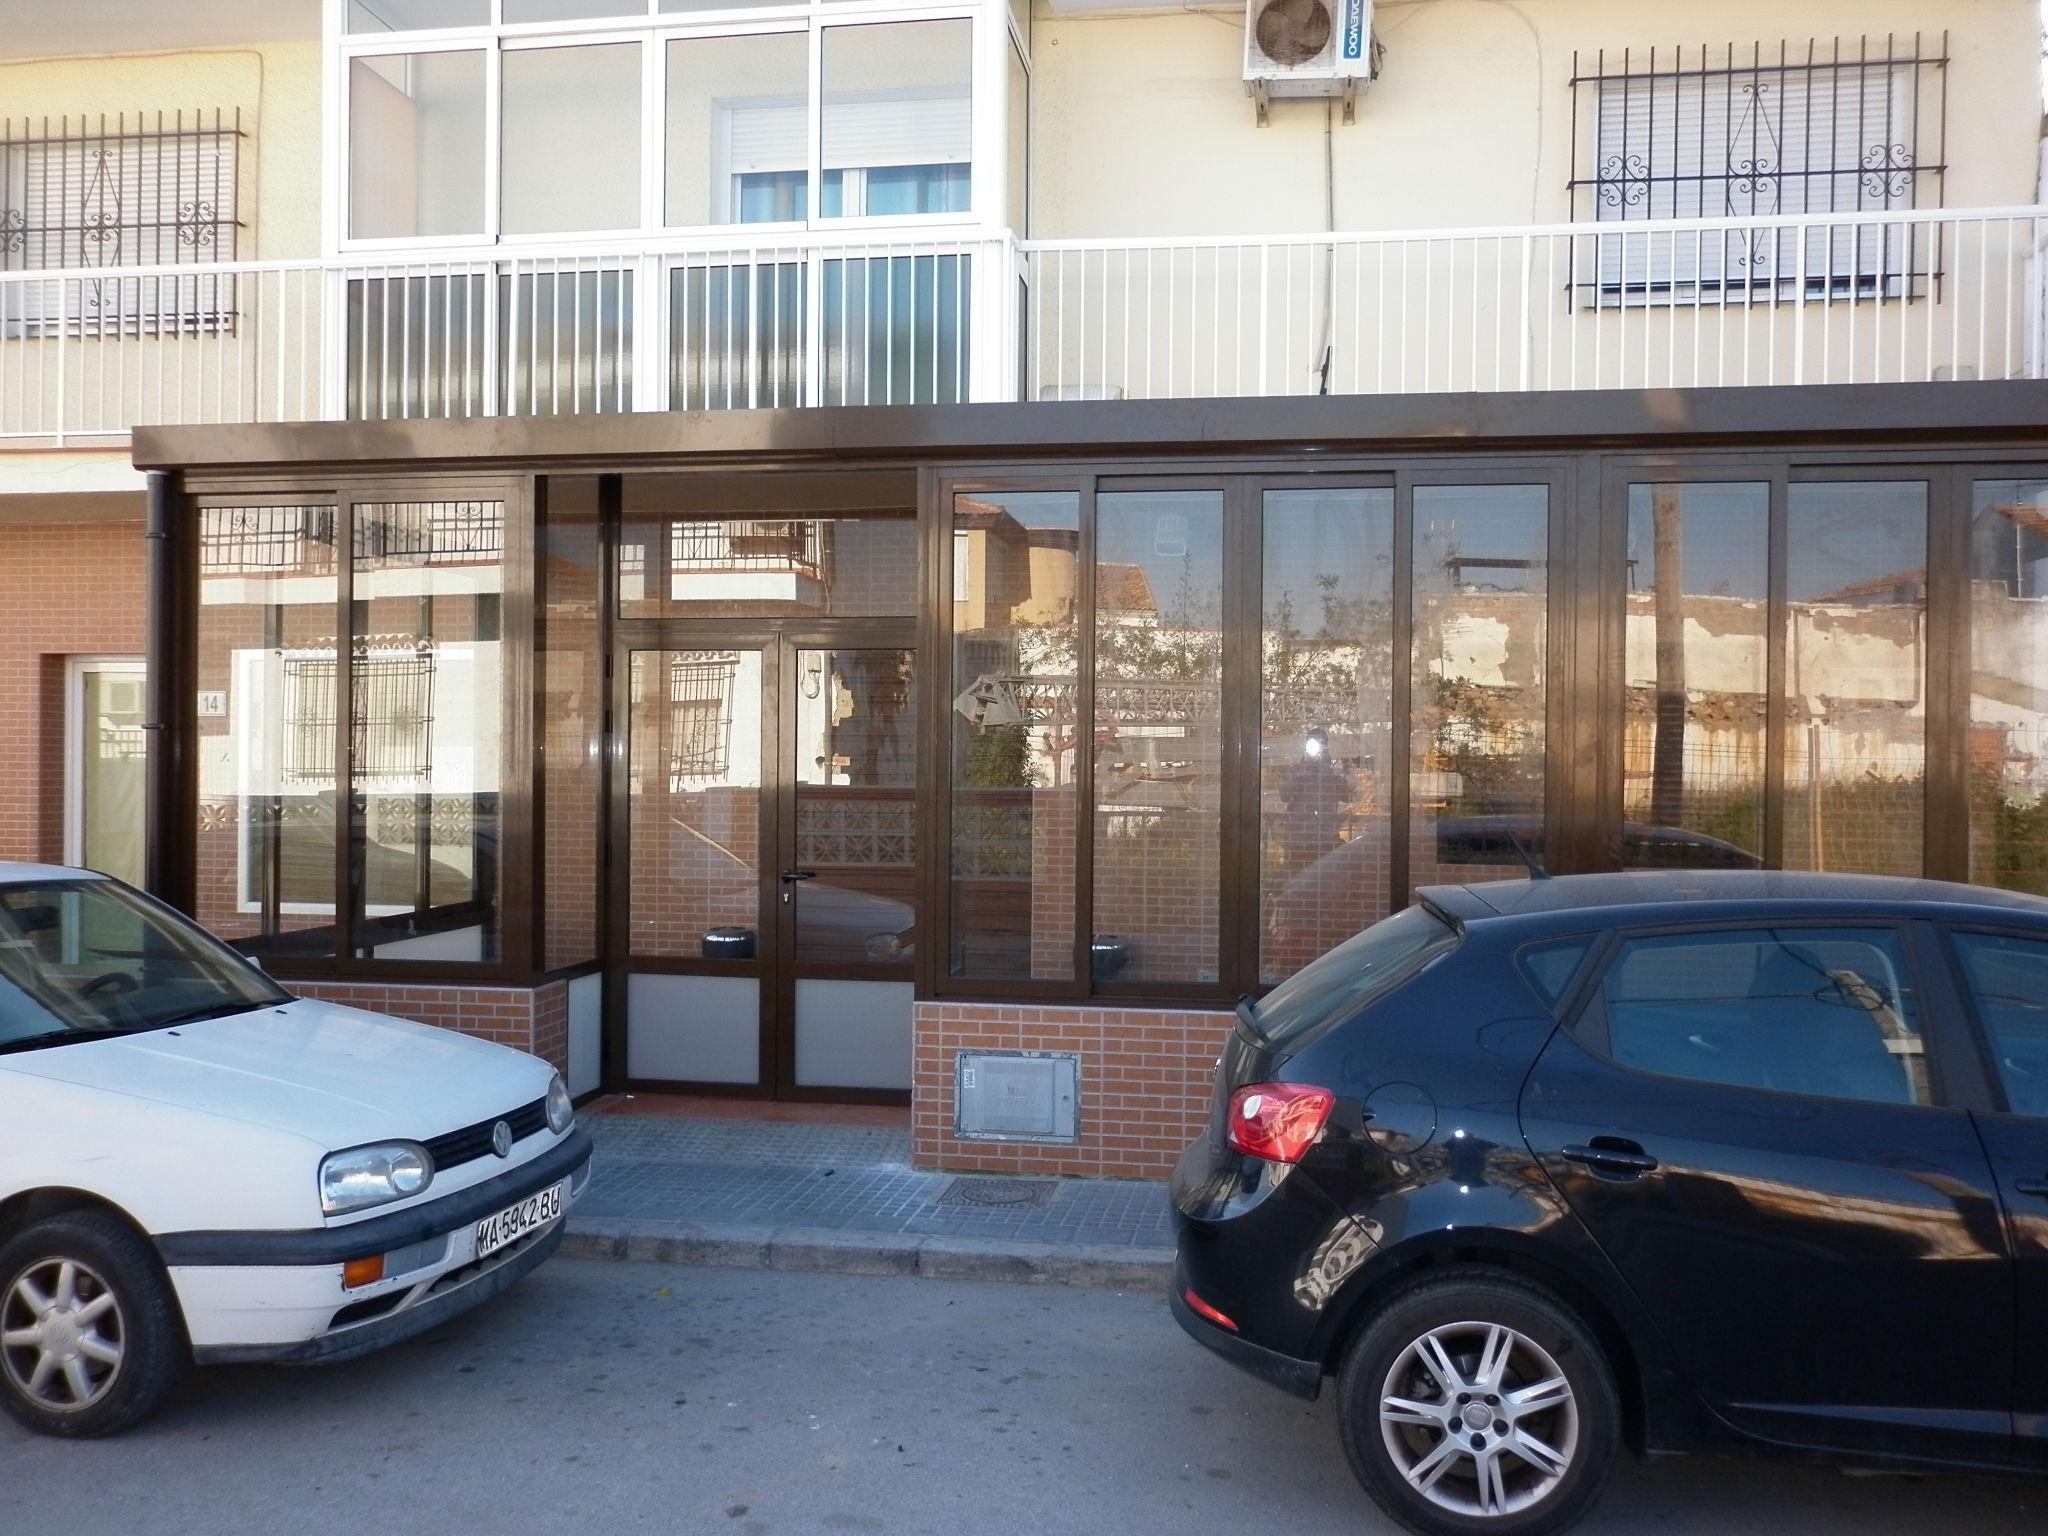 Foto 27 de Carpintería de aluminio, metálica y PVC en Málaga | Aluminios Alunoe